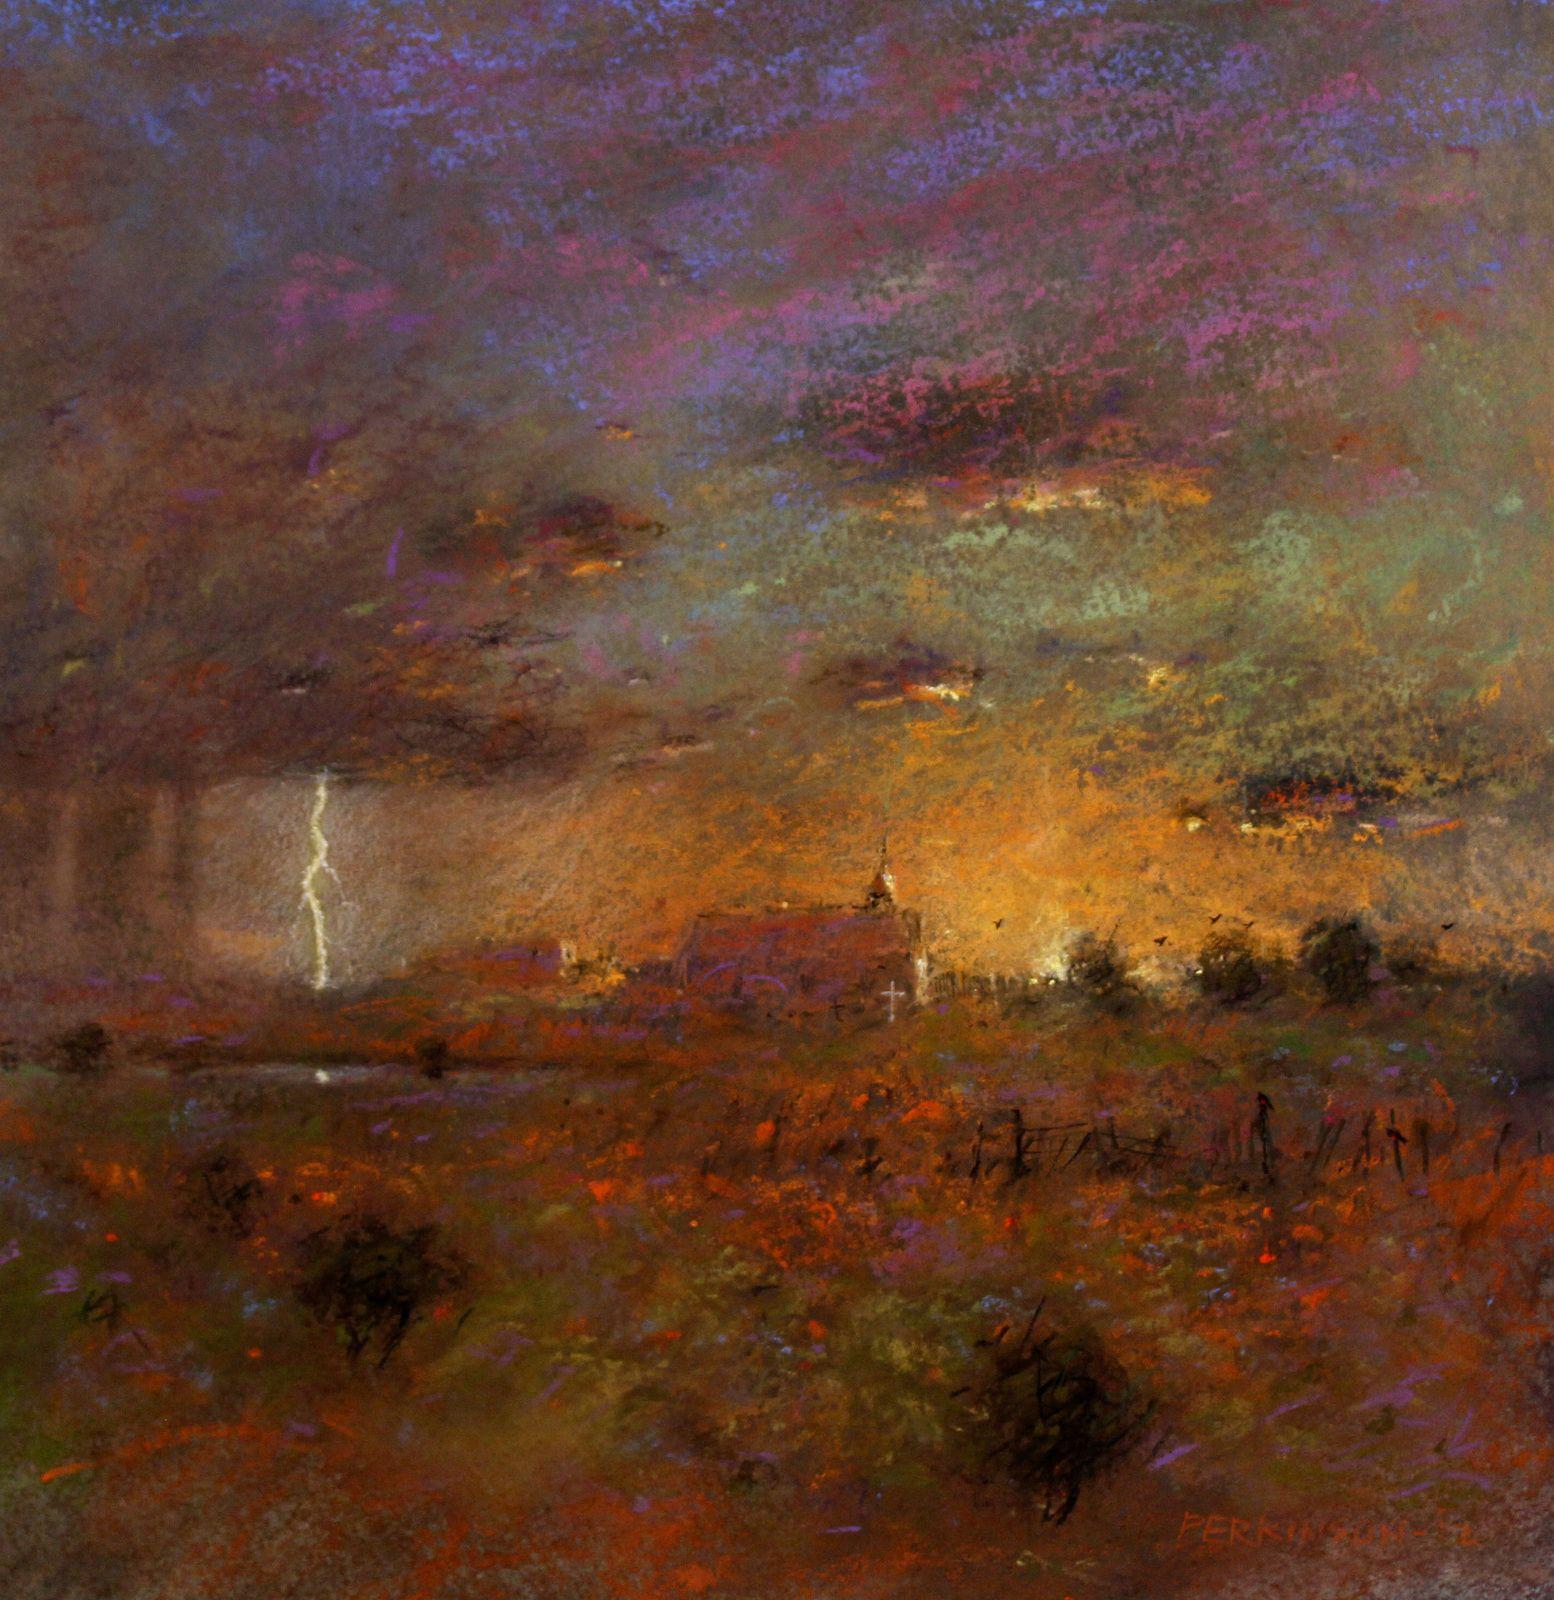 Summer Lightning - New Mexico Landscape Art Painting by Tom Perkinson